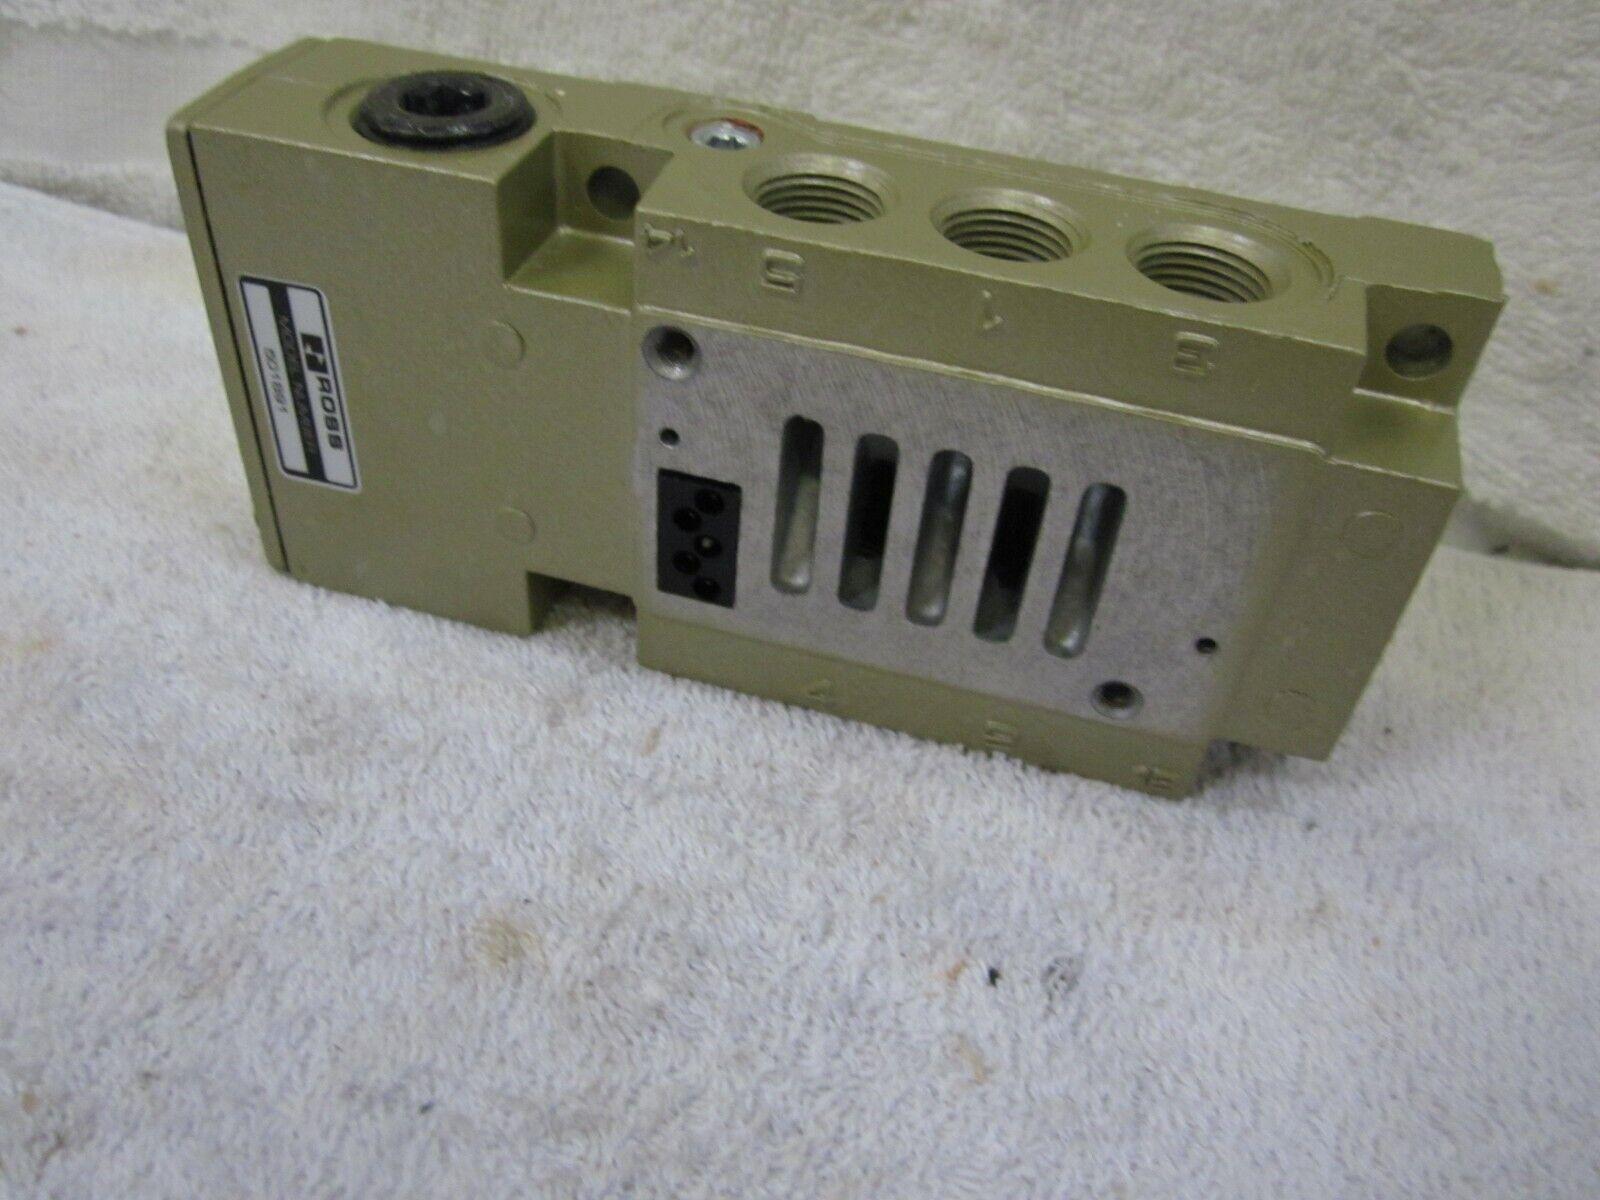 CSKPR 12CA 4C Insert Cartridge Tool Holder Kennametal 1pc